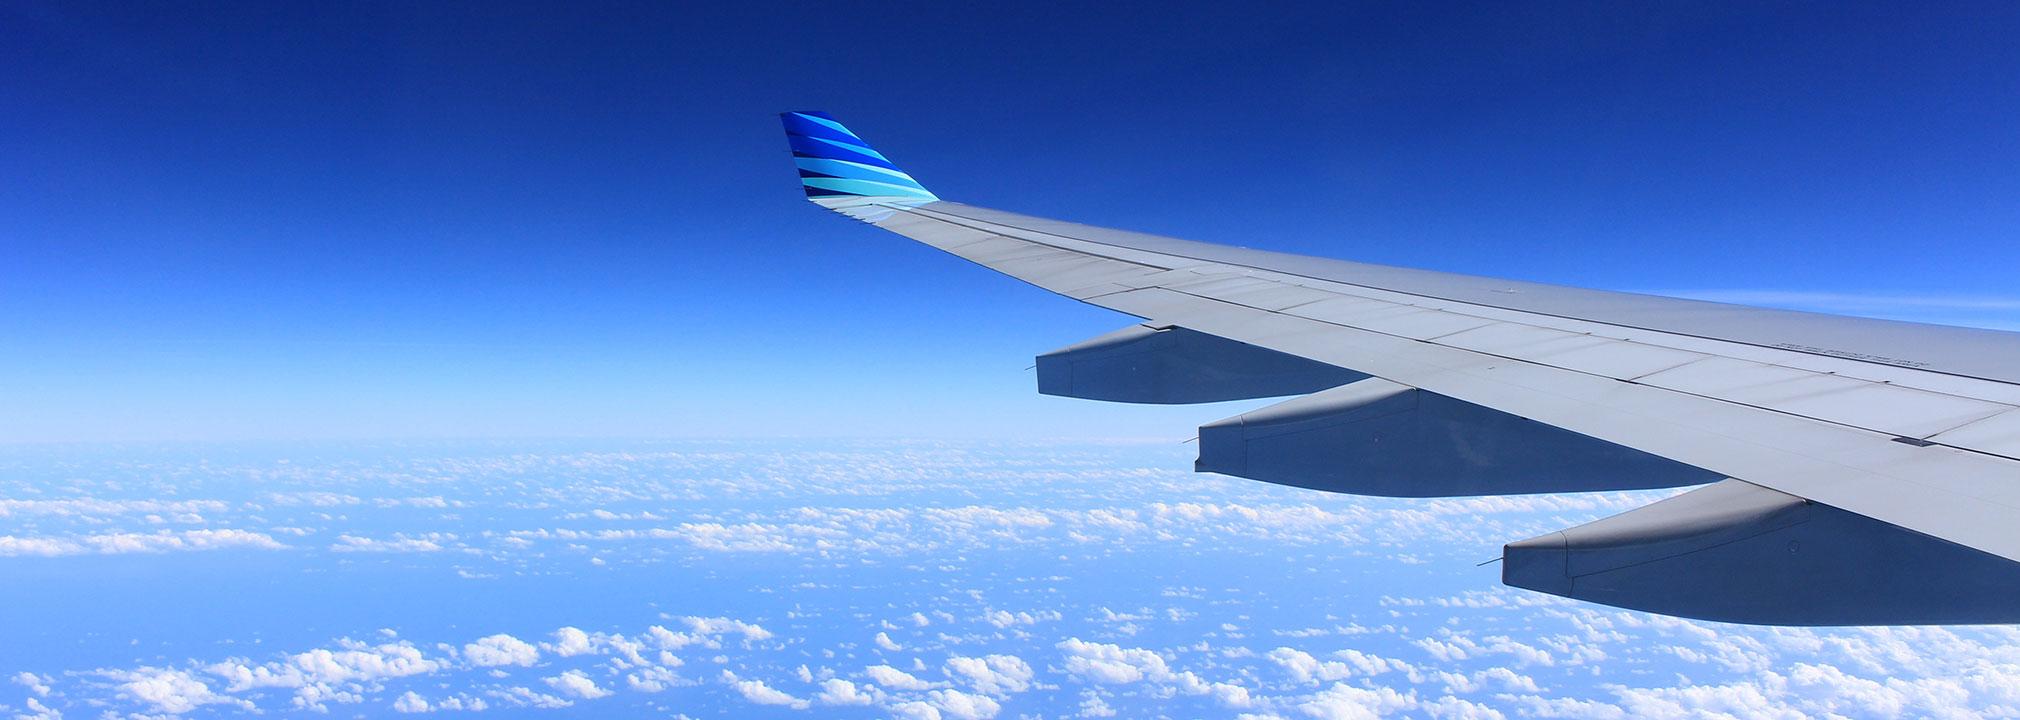 Flug verfolgen mit myradar24